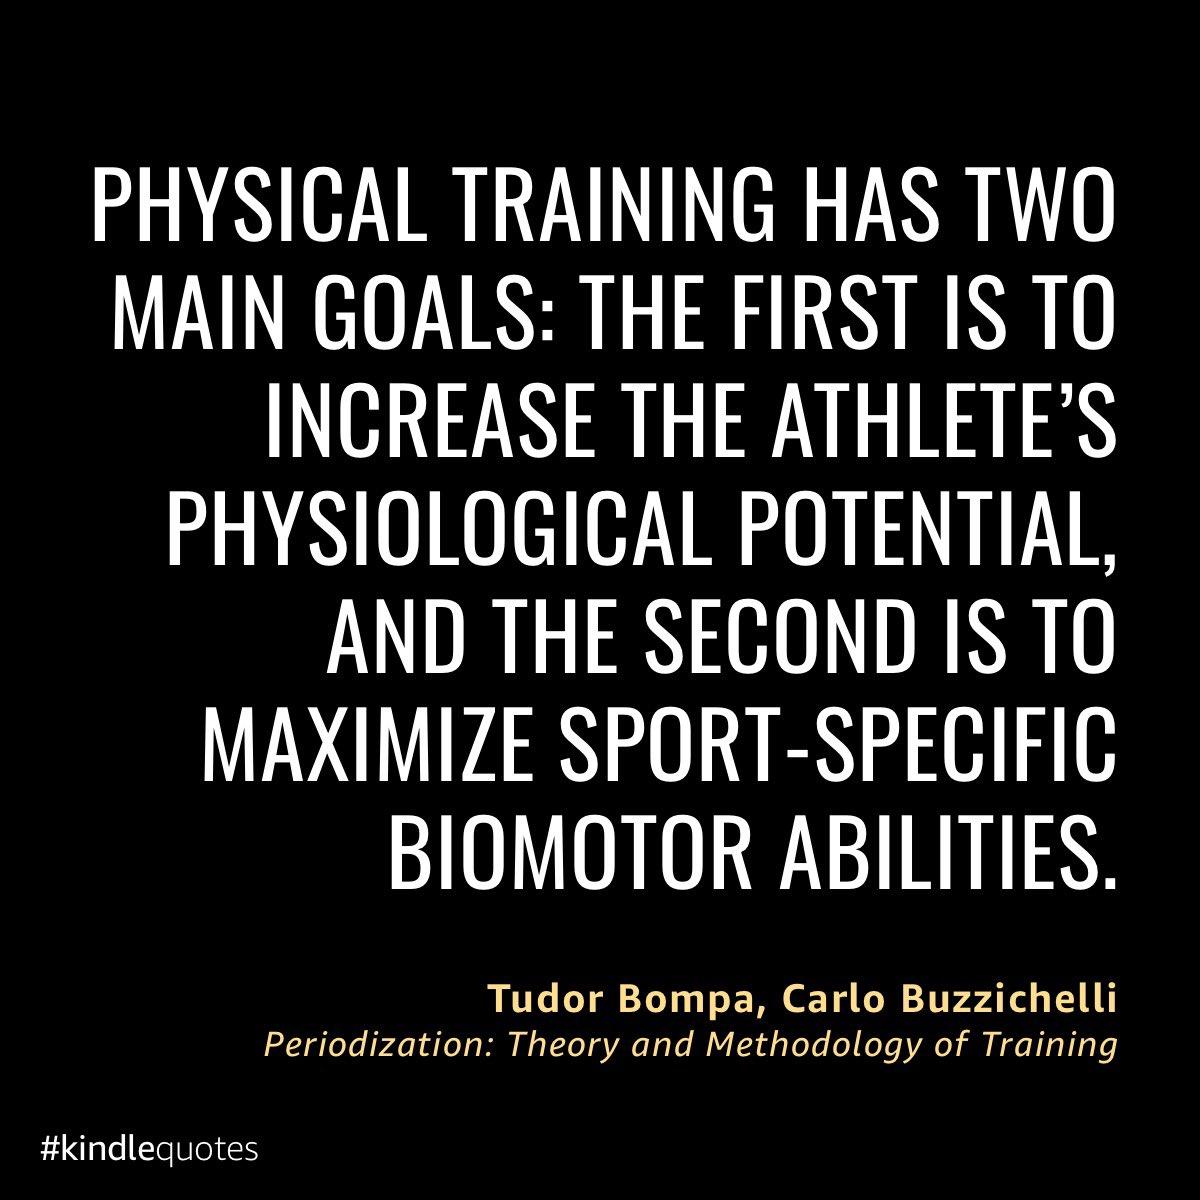 Know your goals! https://t.co/gu9o4P1GcS